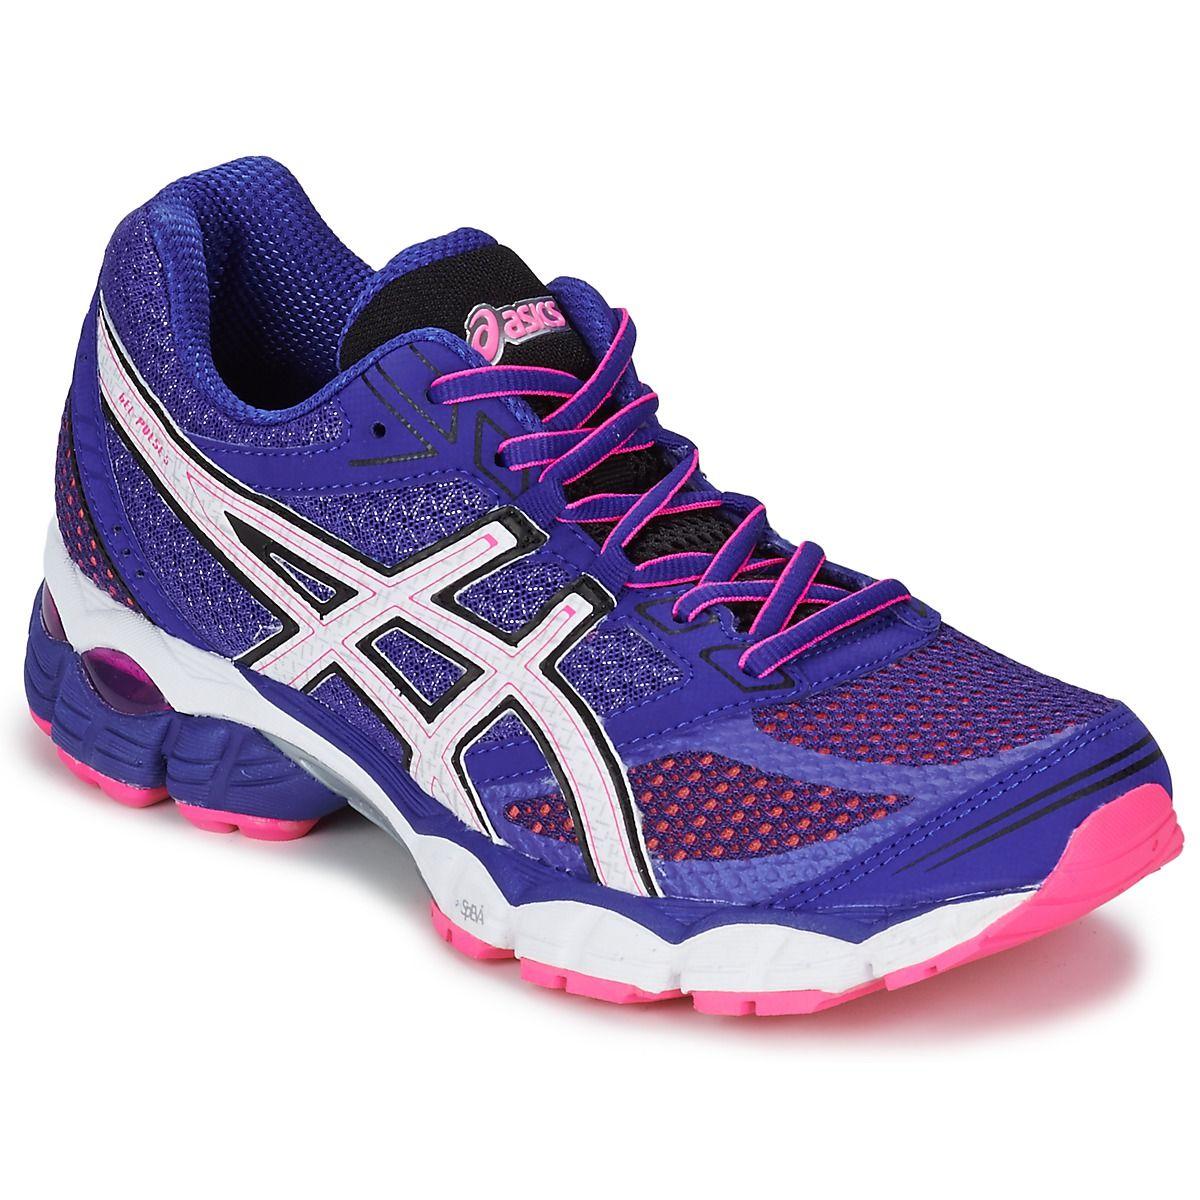 Chaussures-de-running Asics GEL-PULSE 5 Violet / Blanc / Rose